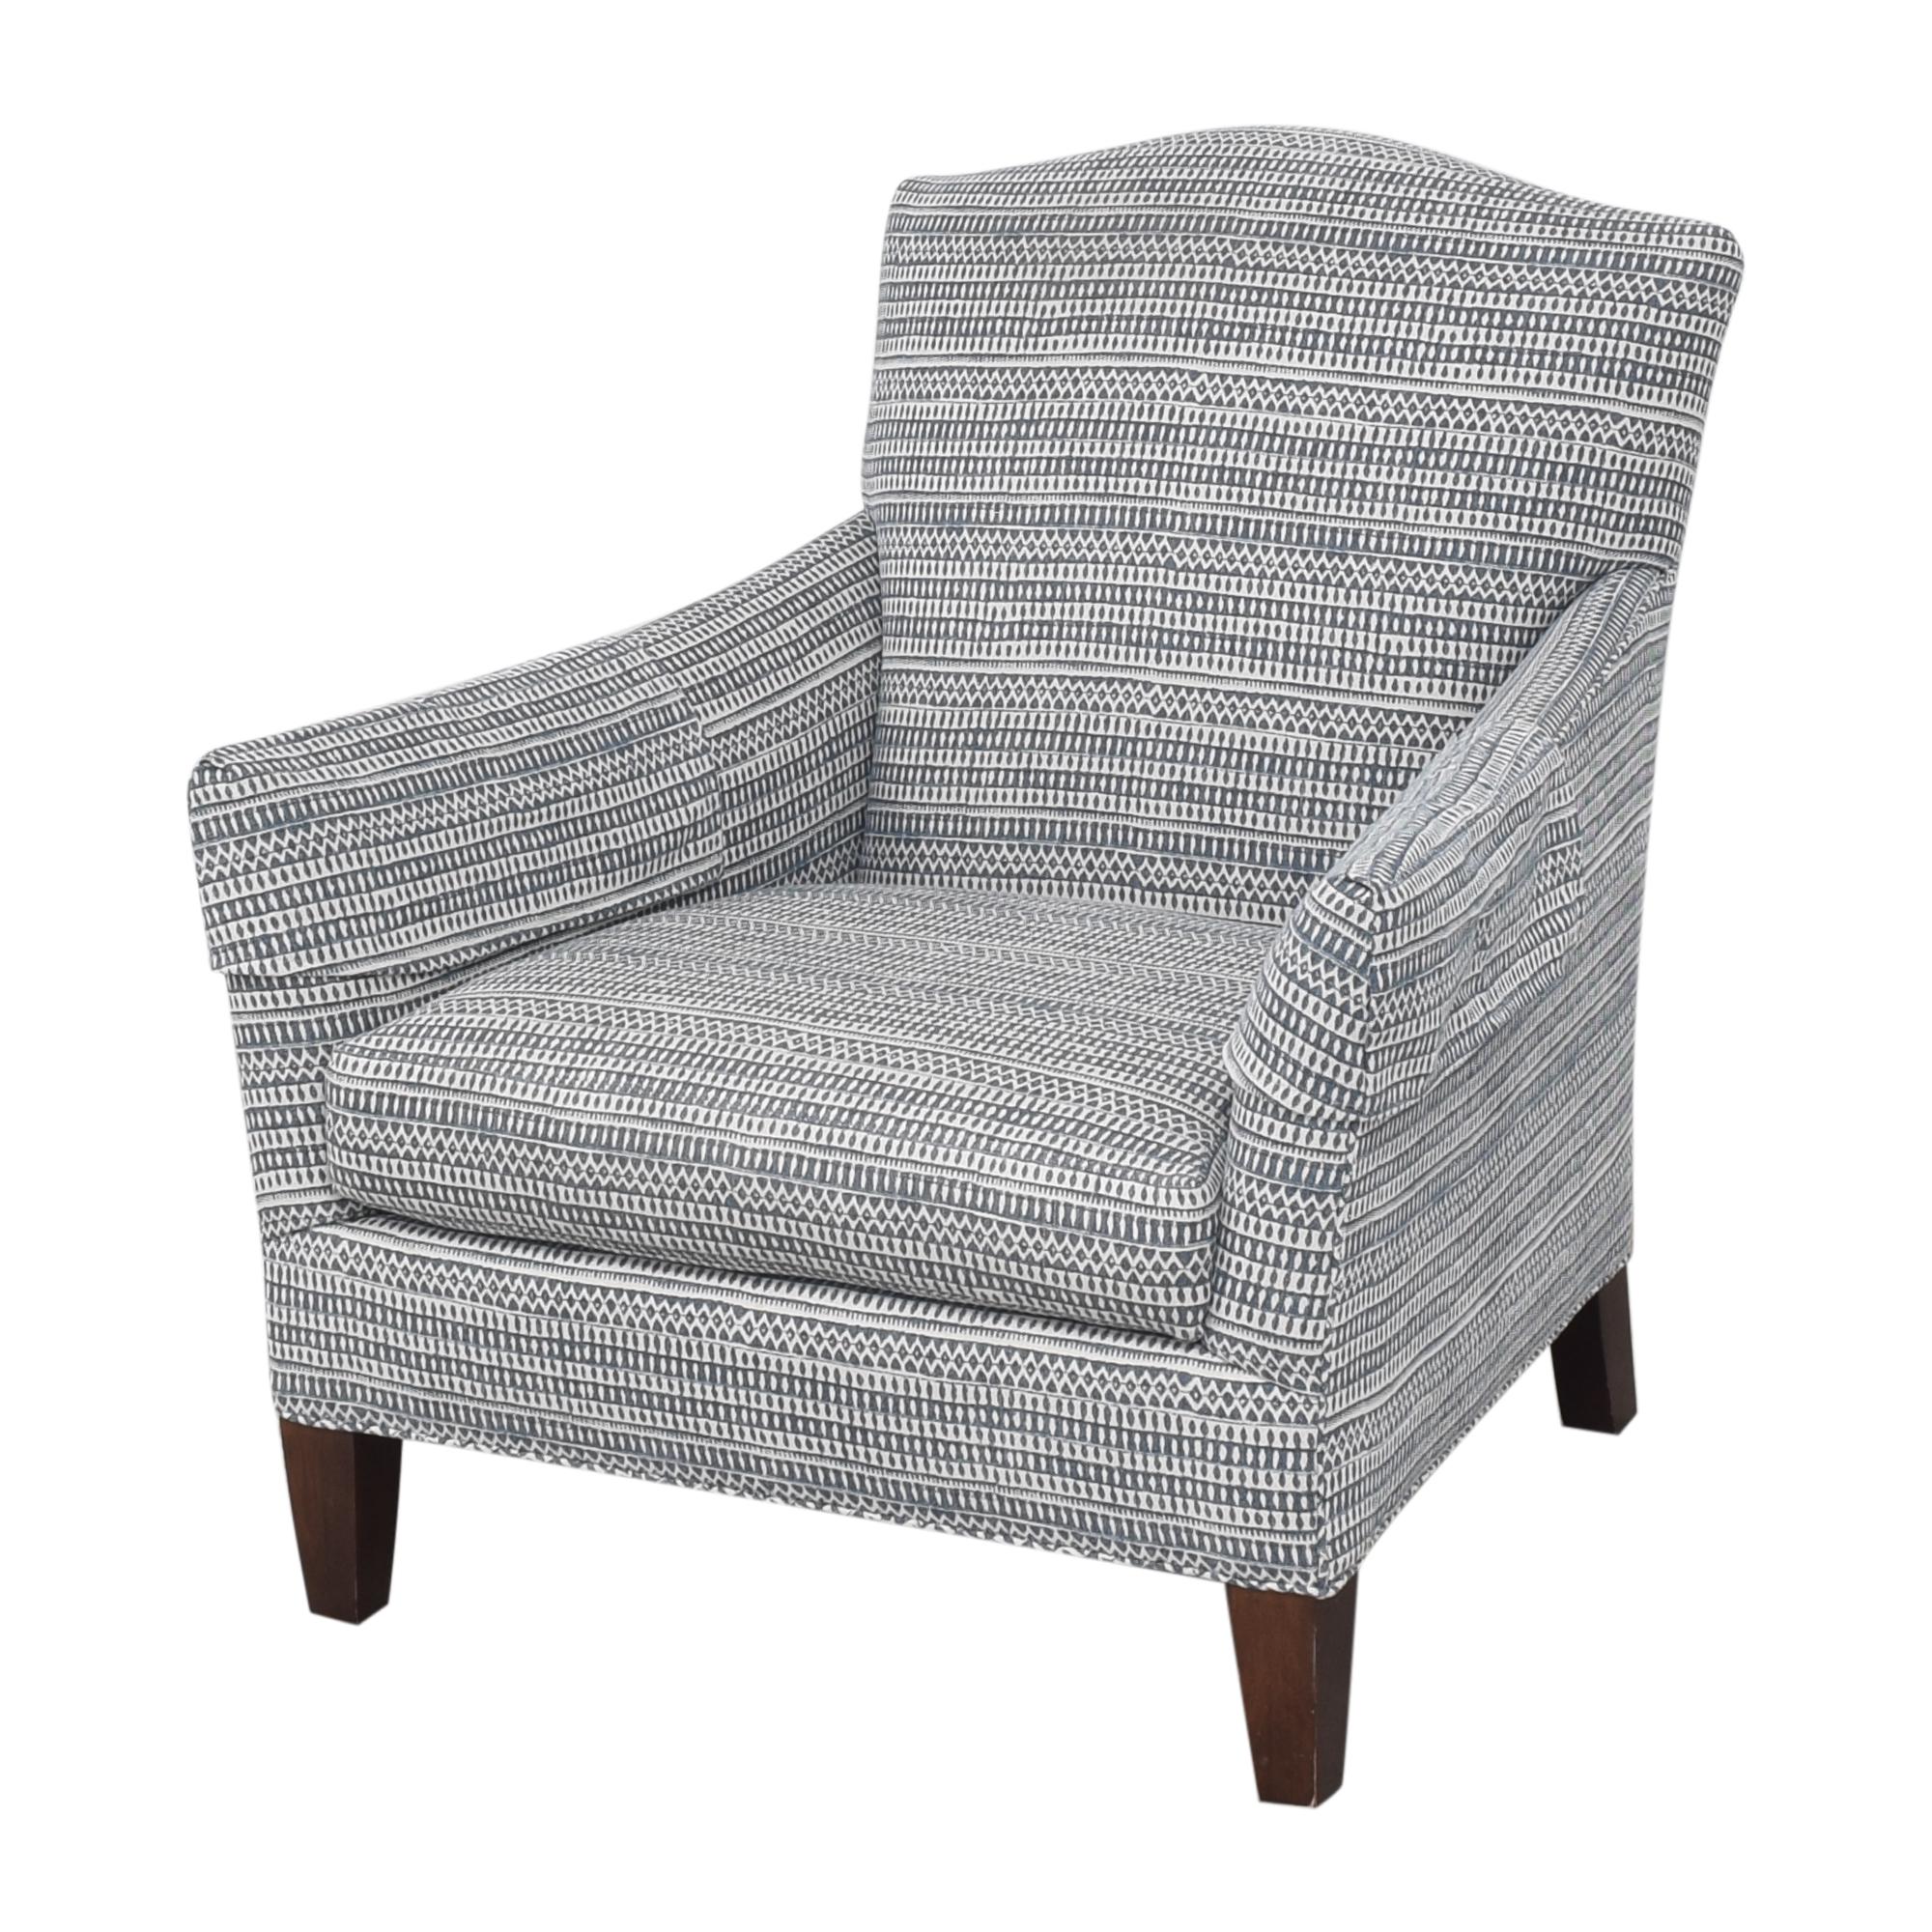 buy ABC Carpet & Home Accent Chair ABC Carpet & Home Chairs